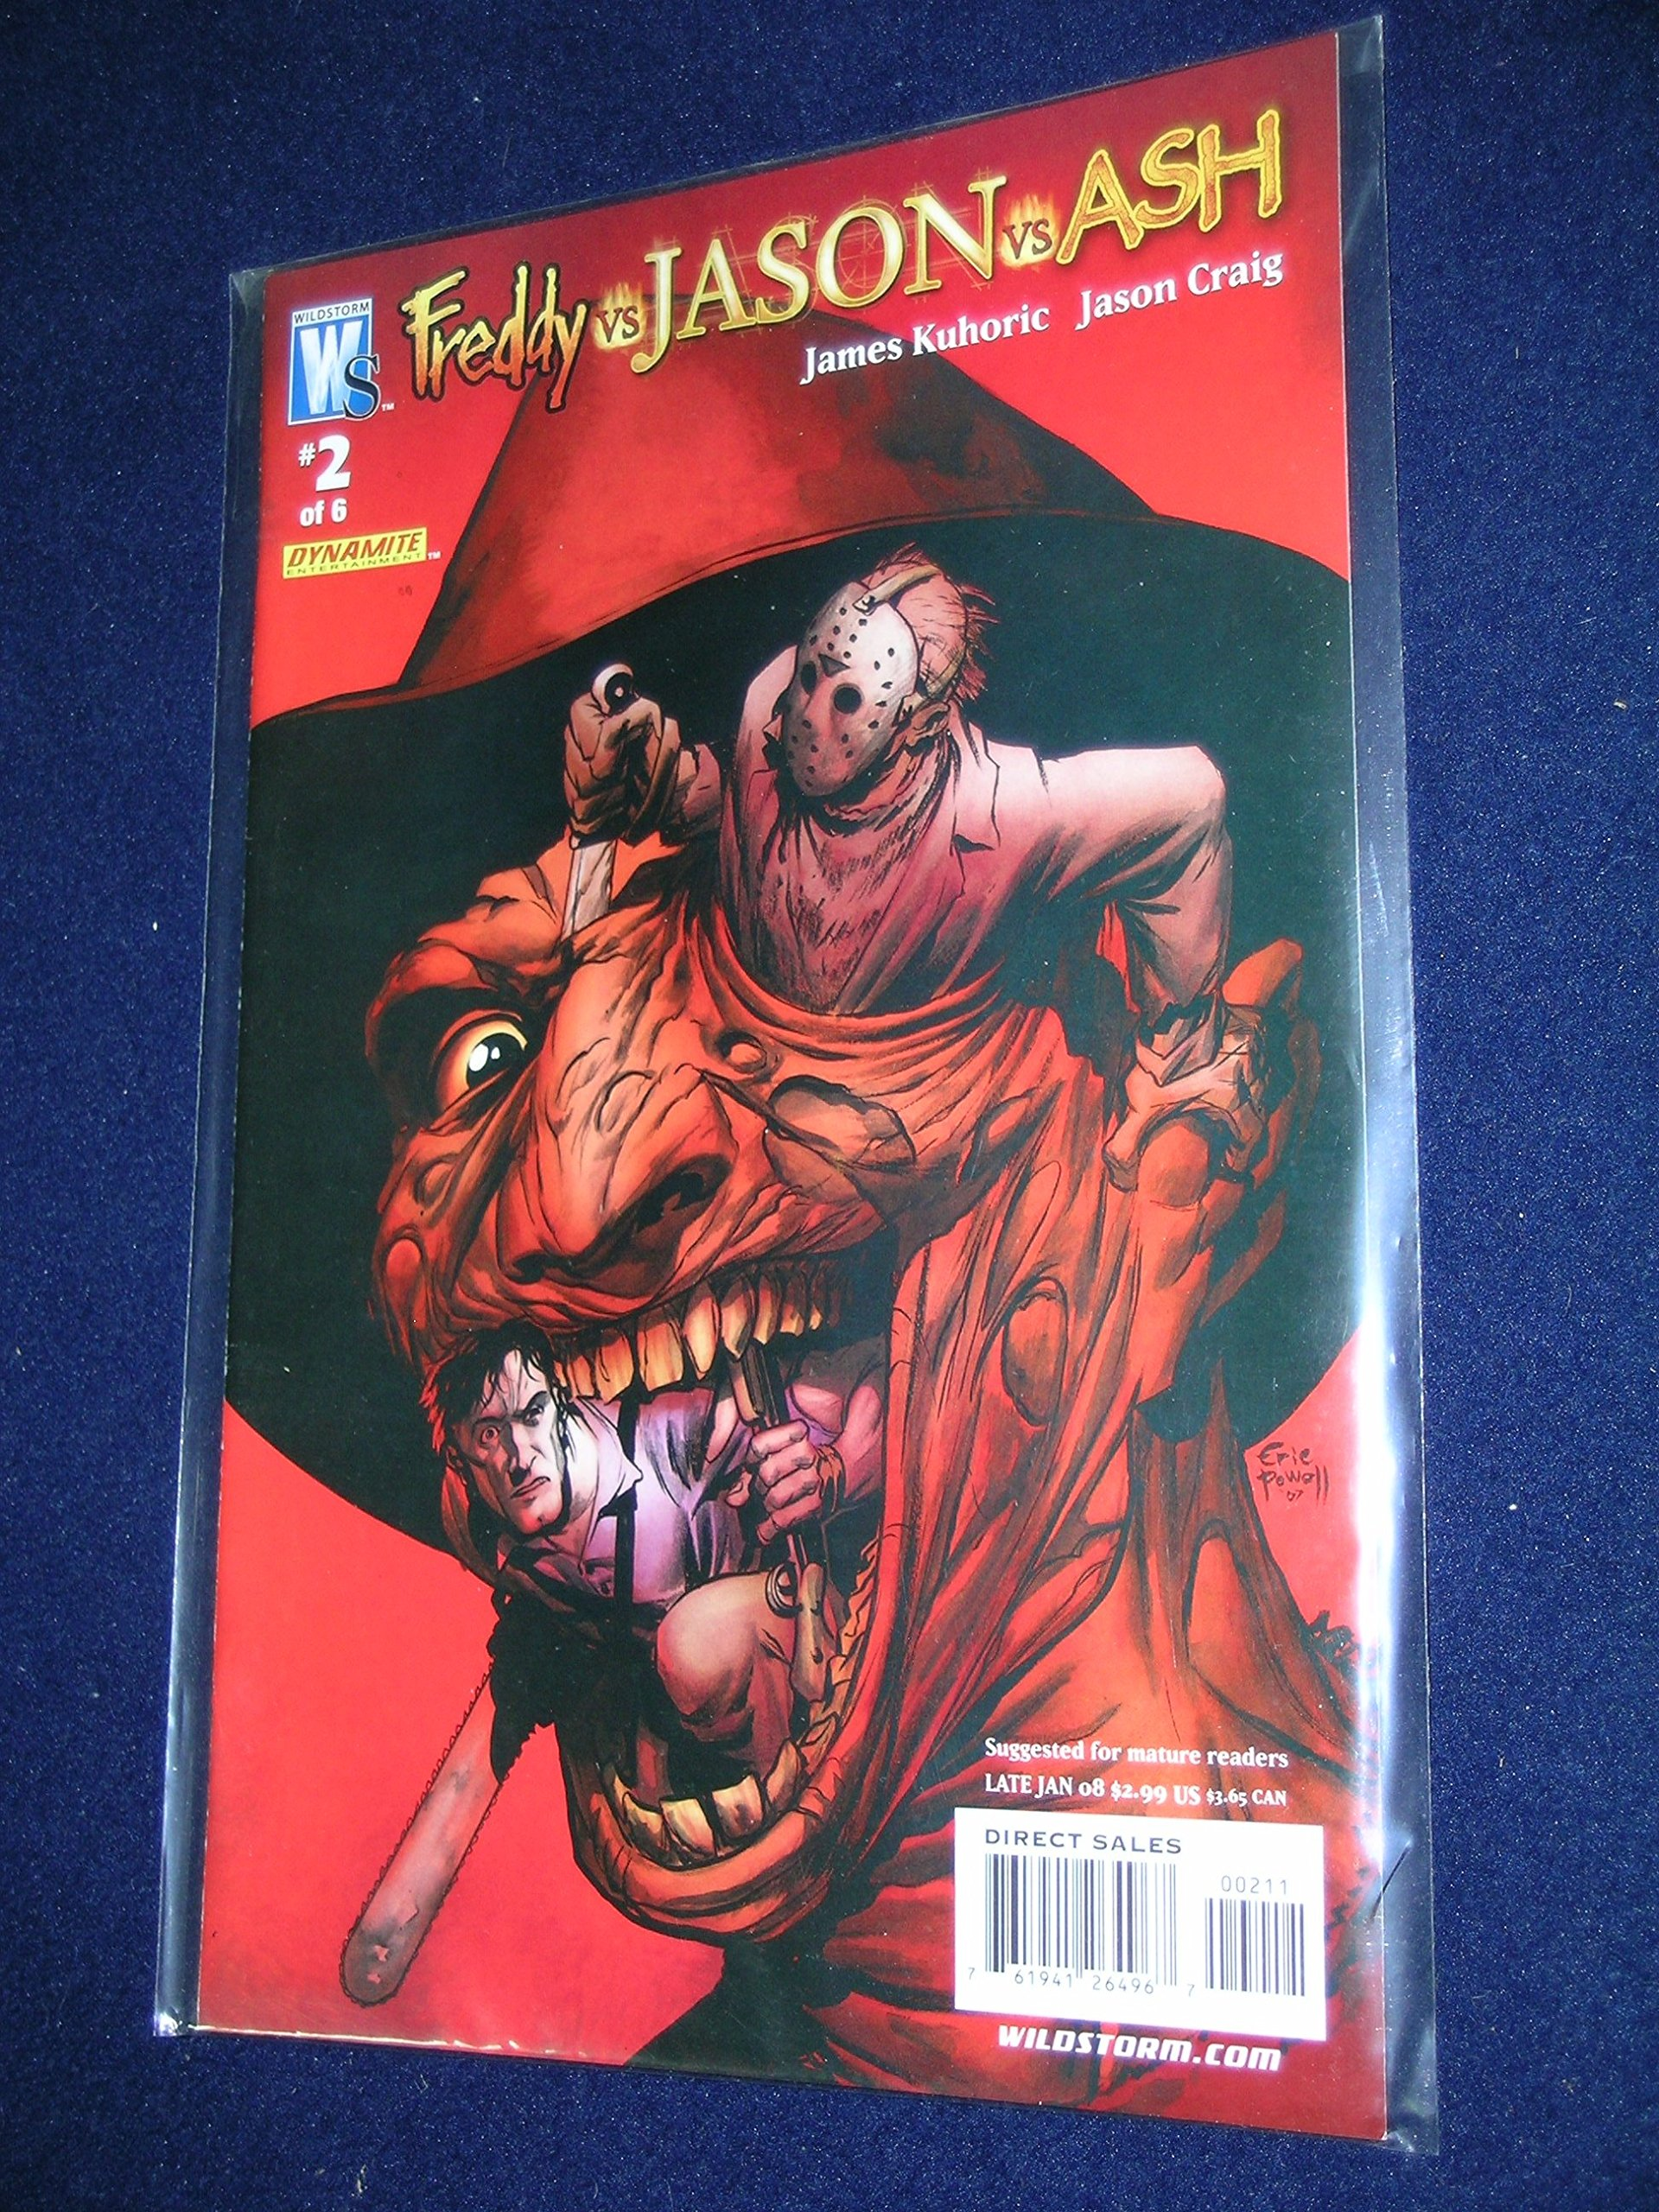 Freddy Vs. Jason Vs. Ash #2 (Wildstorm - DC Comics) pdf epub